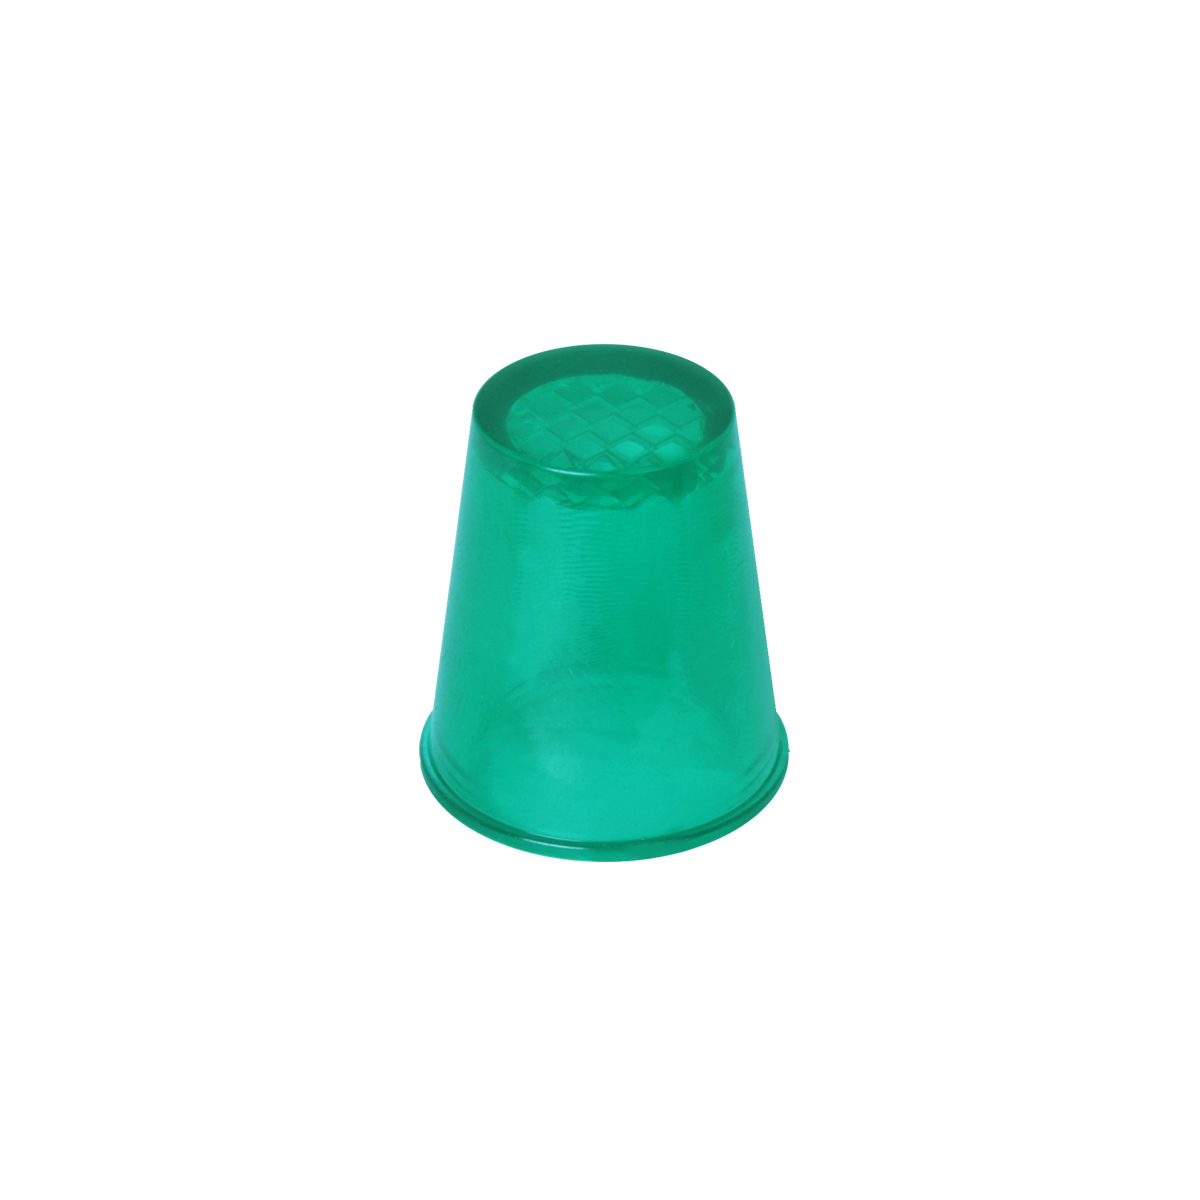 #94128 Green Cap Style Lens